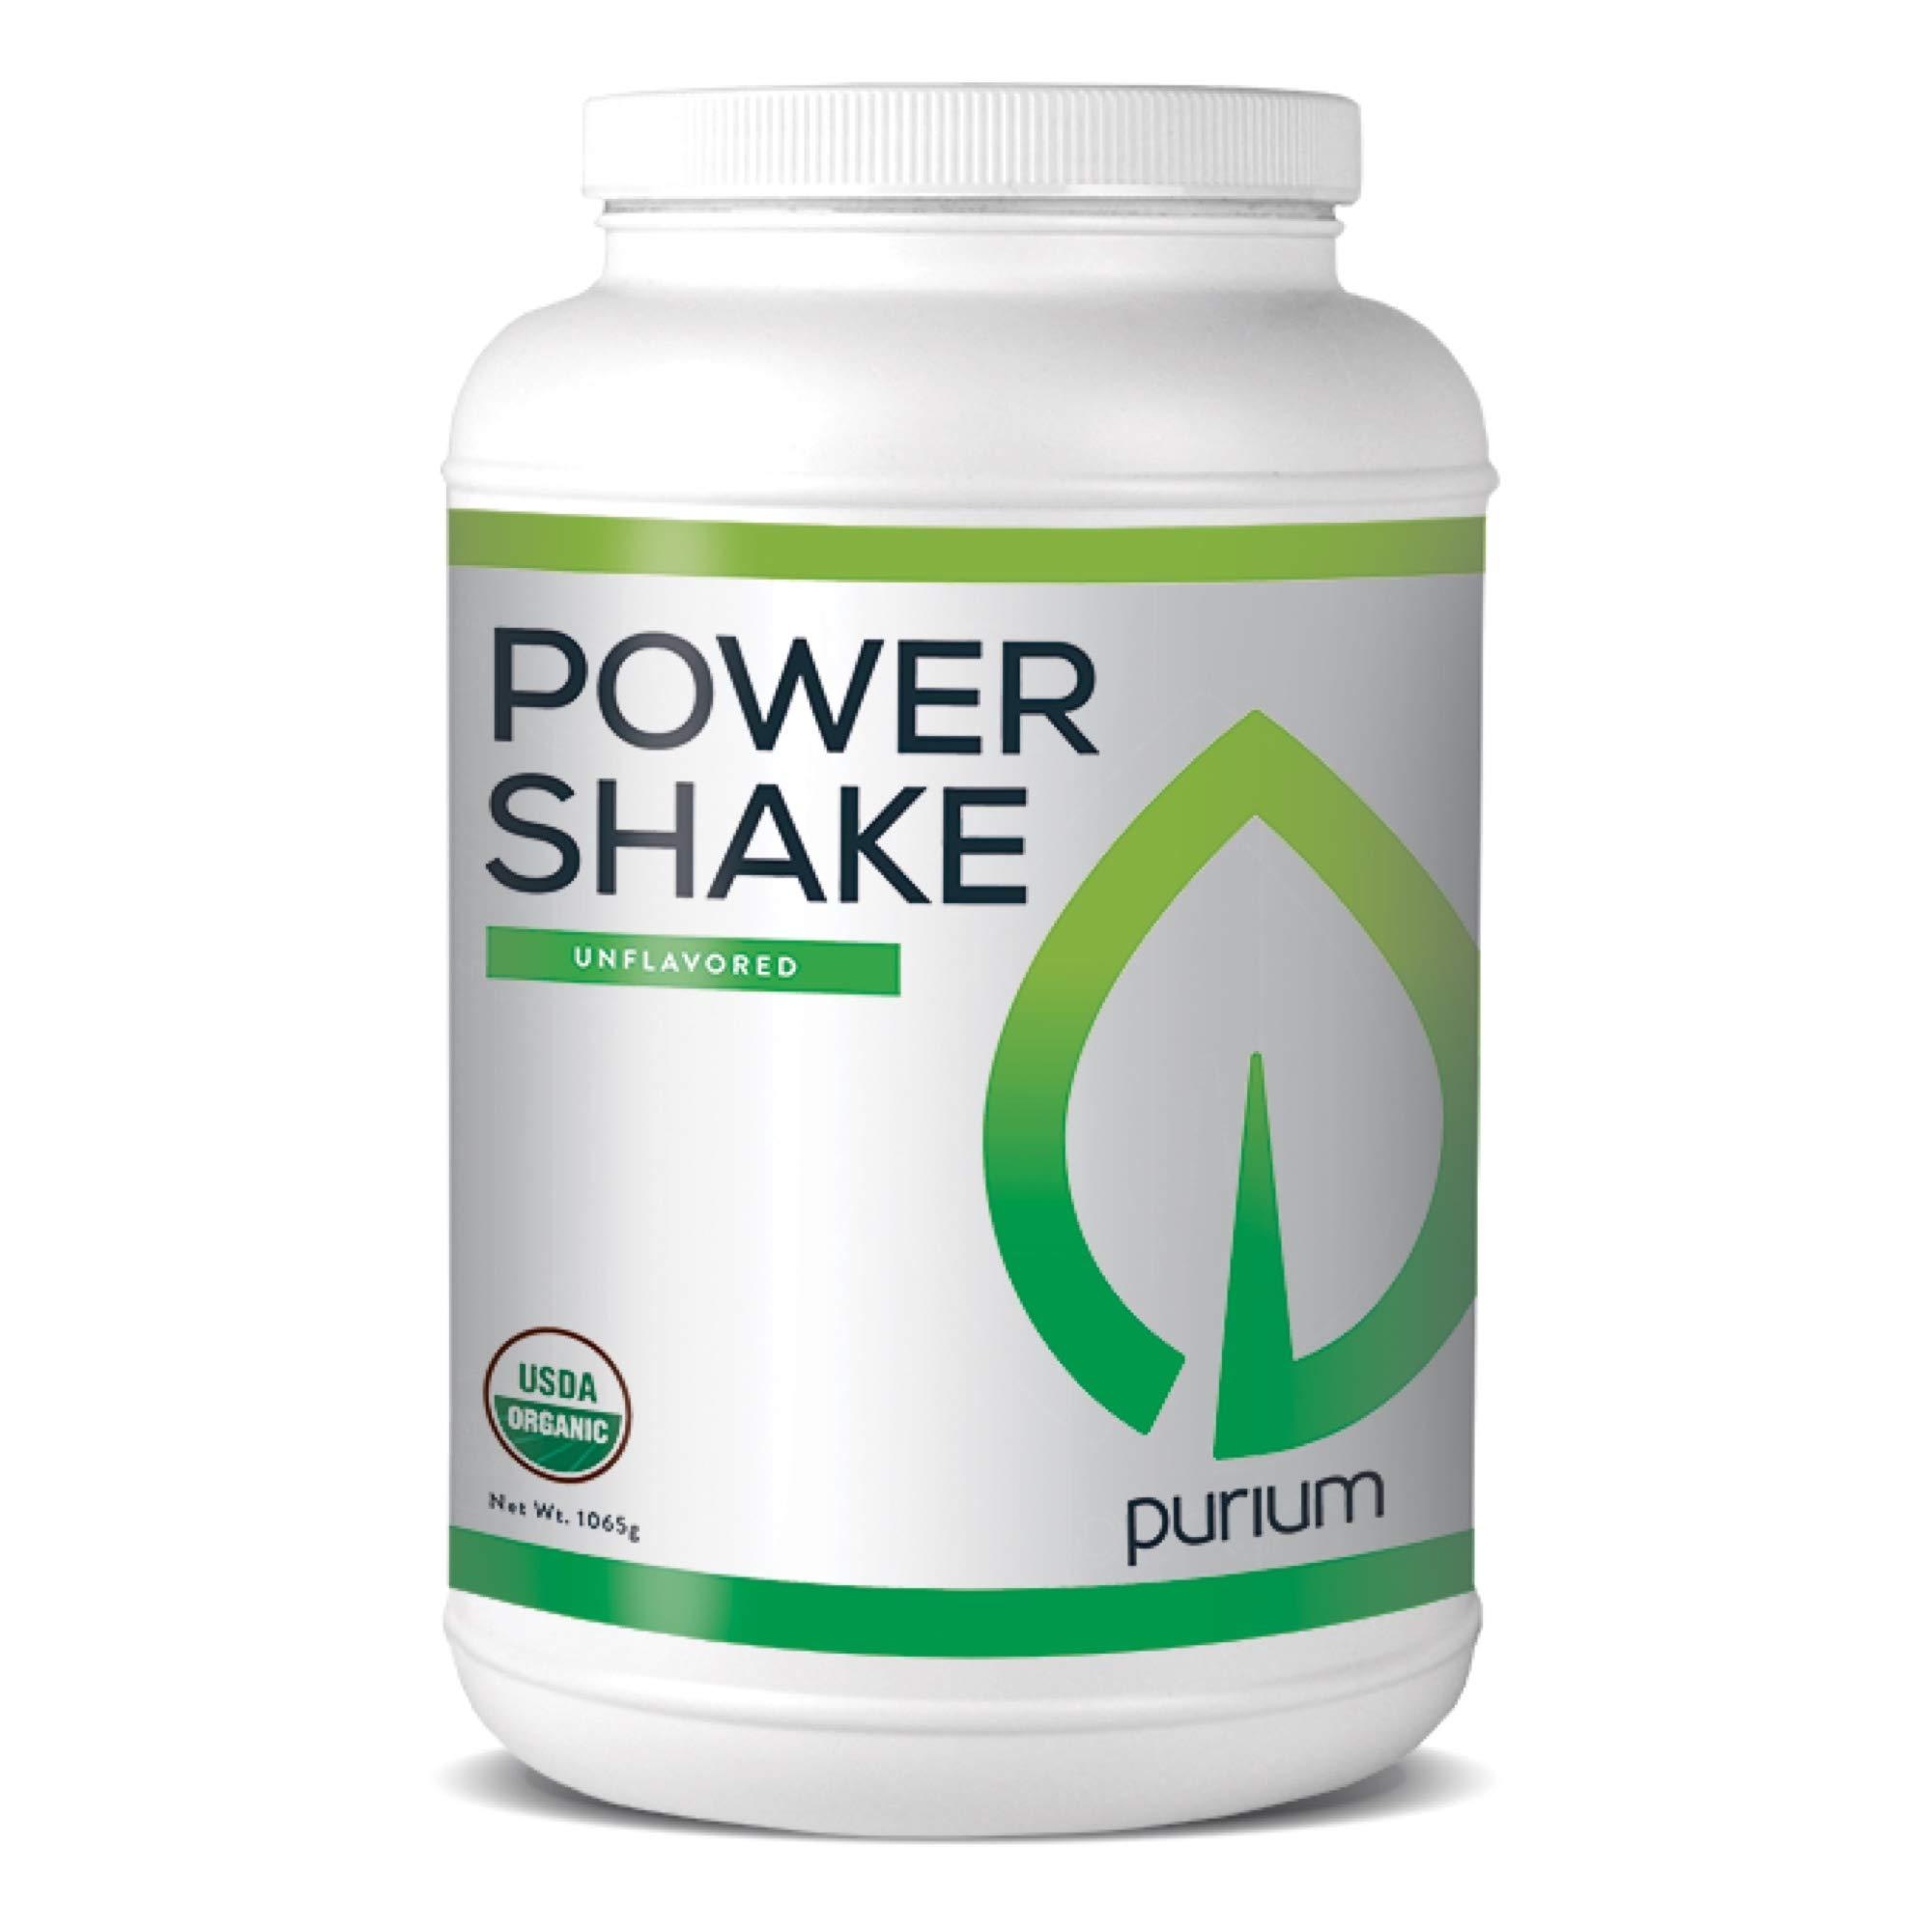 Purium Power Shake - Unflavored - 1065 Grams - Vegan Meal Replacement Powder, Protein, Vitamins & Minerals - Certified USDA Organic, Gluten Free, Kosher - 30 Servings